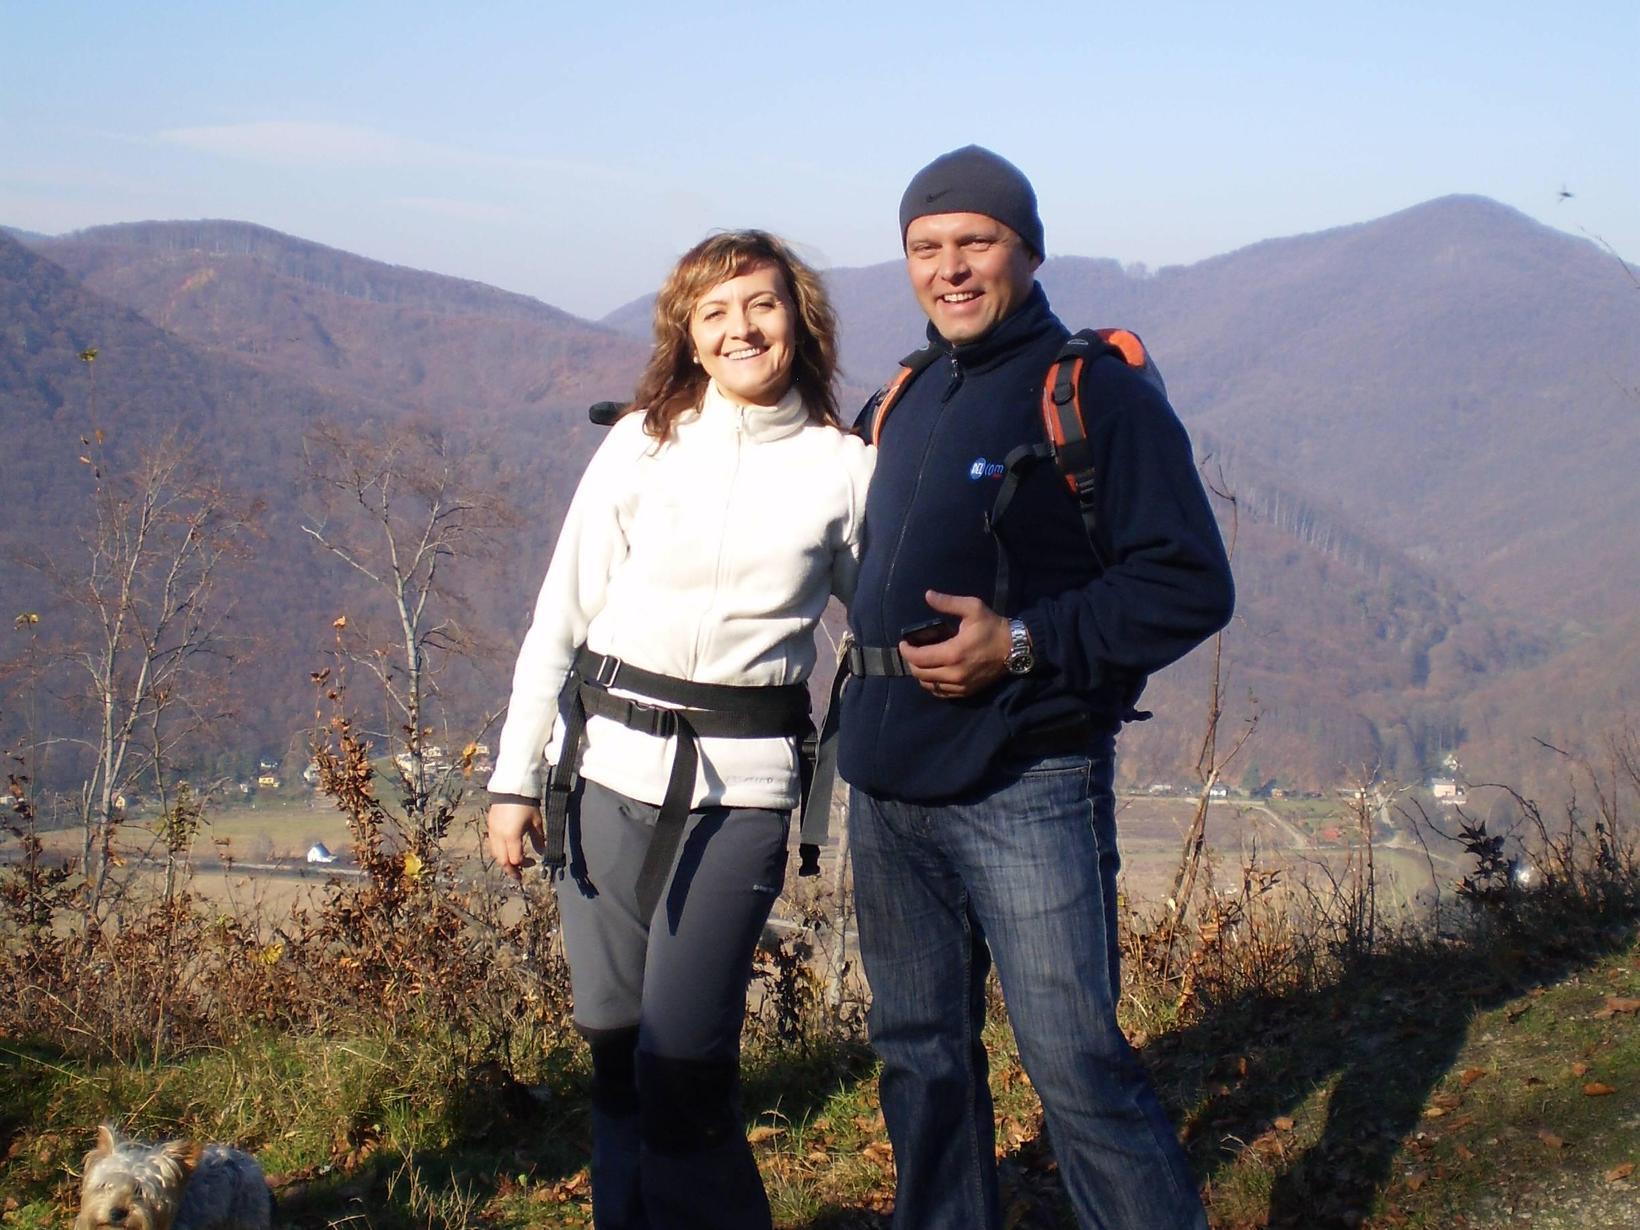 Karol & Denisa from Košice, Slovakia